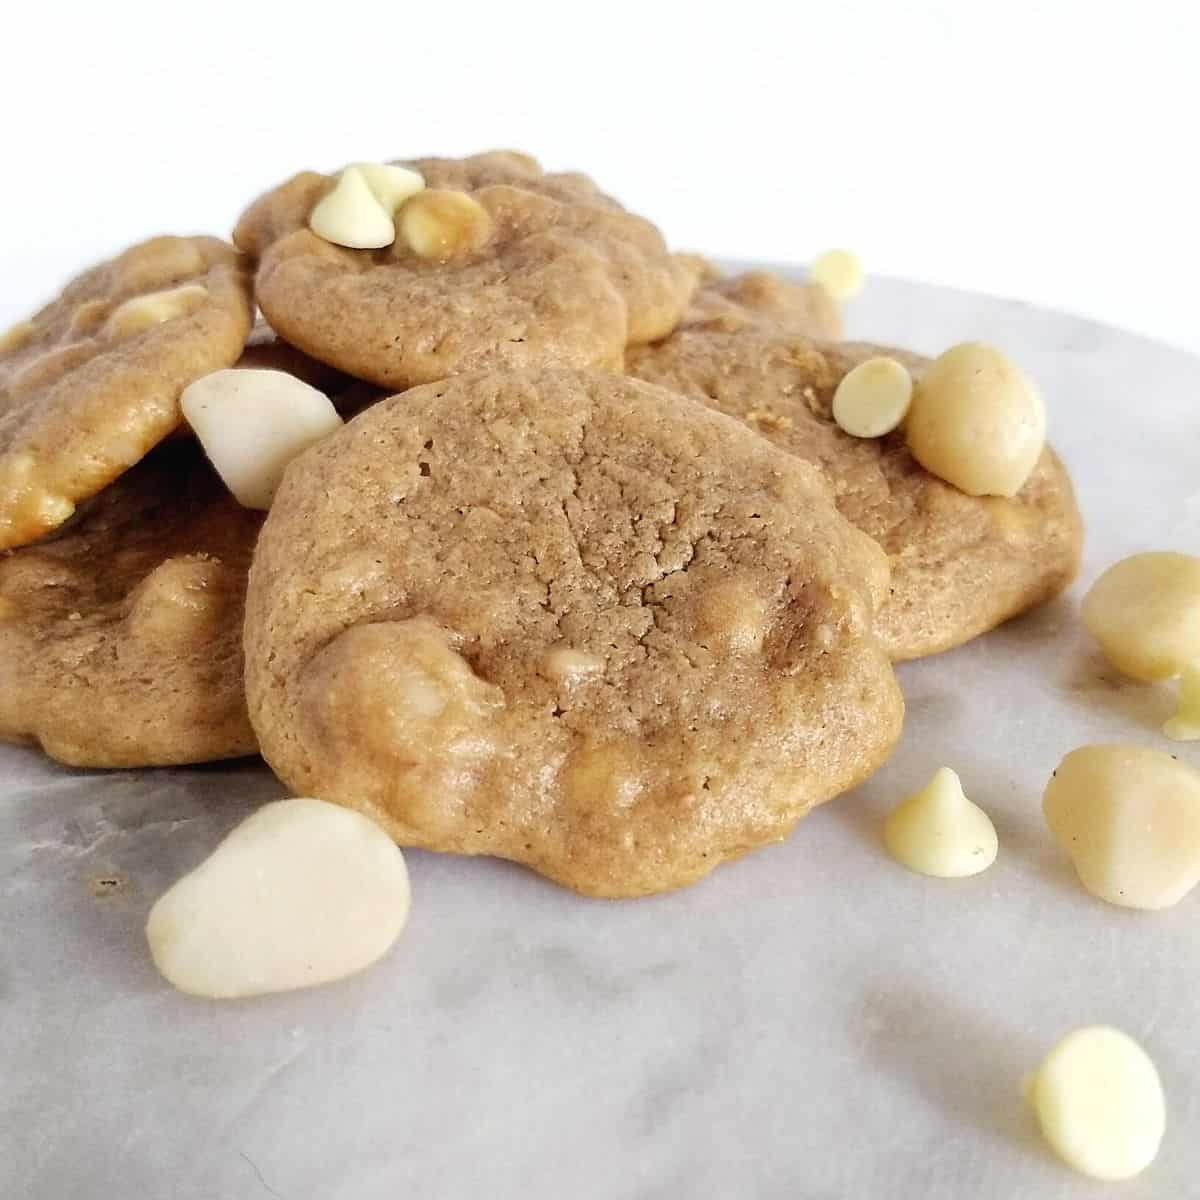 26 - Keto White Chocolate Macadamia Nut Cookies